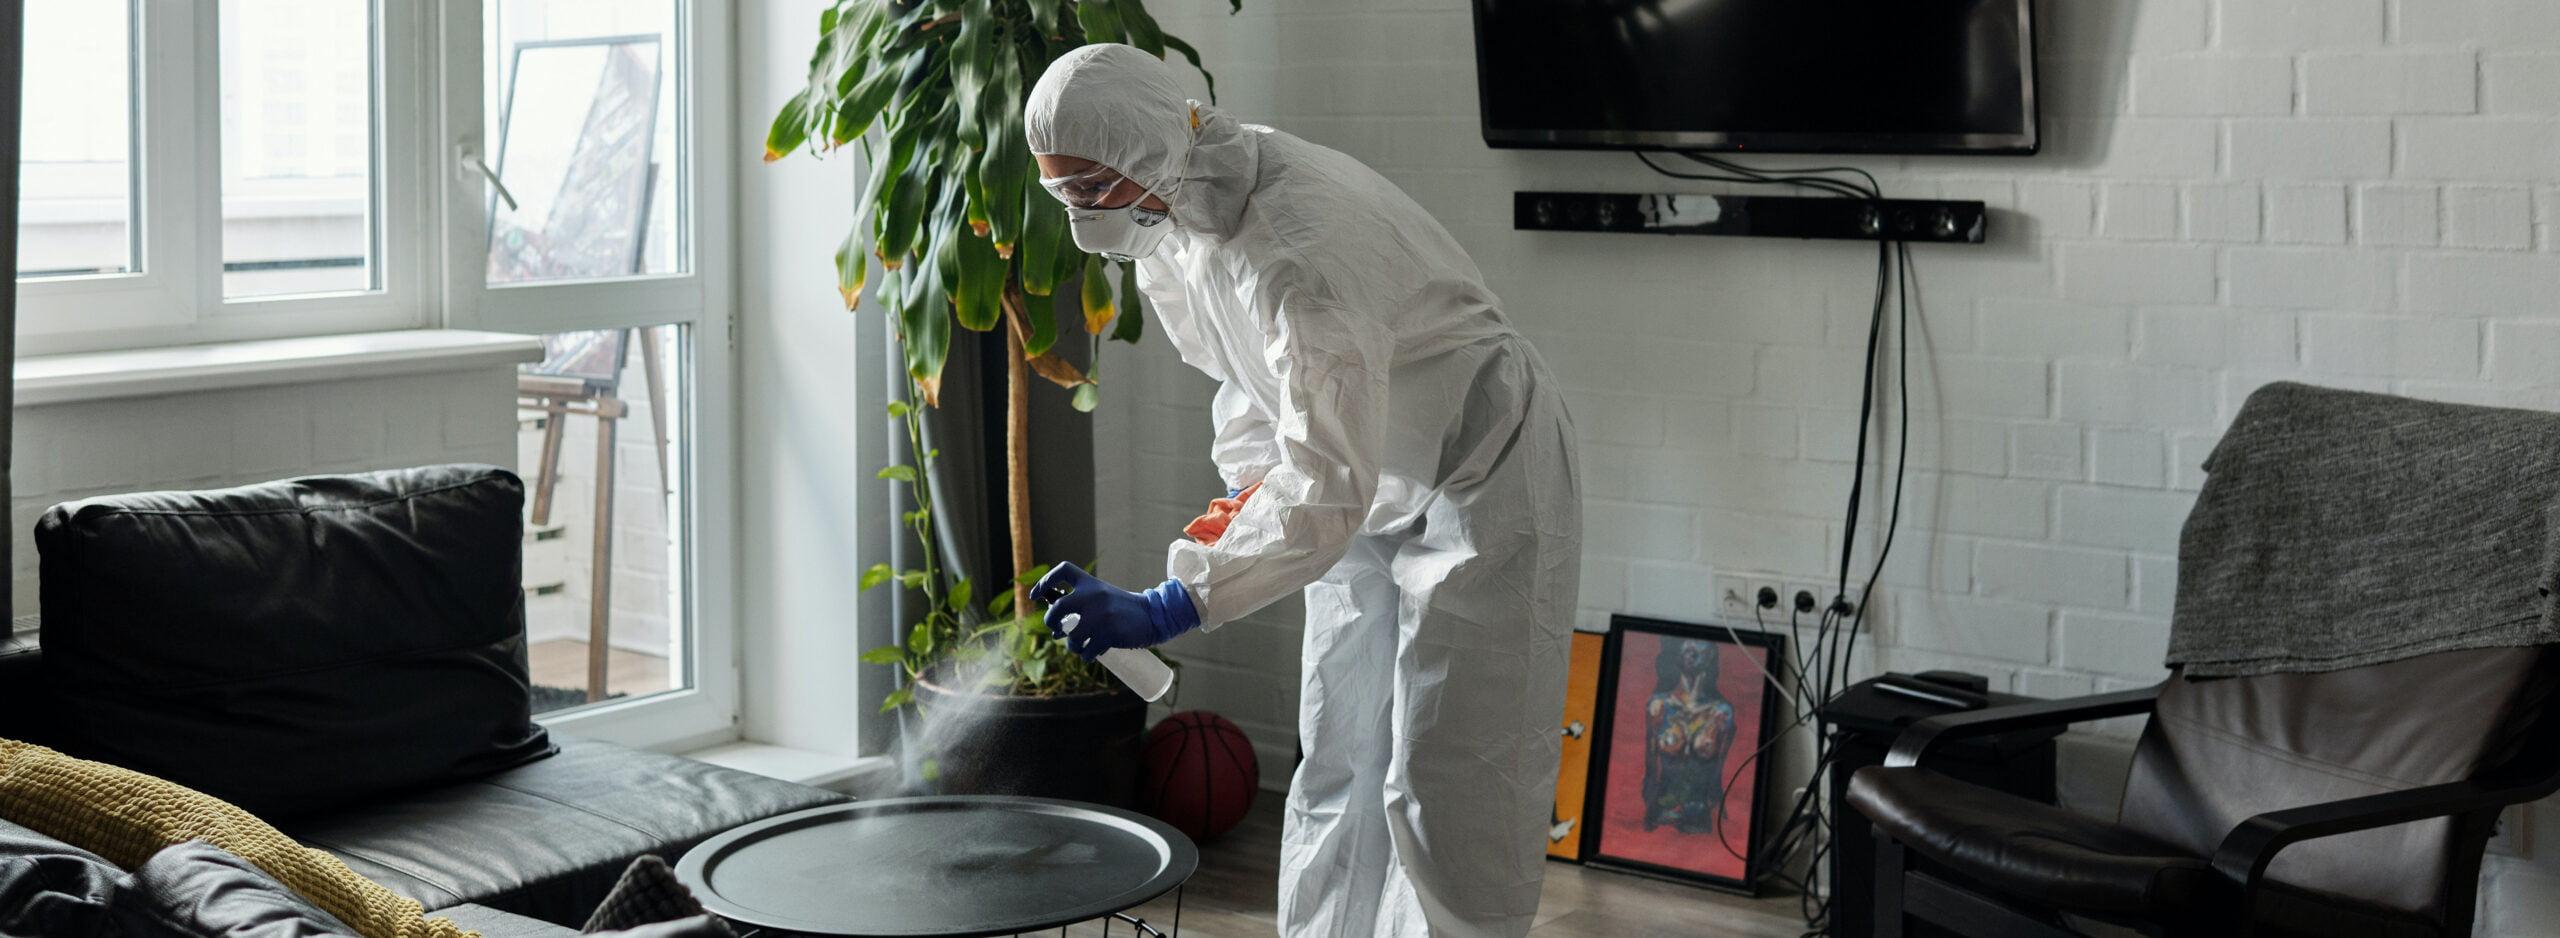 Biohazard Cleanup Long Island NY